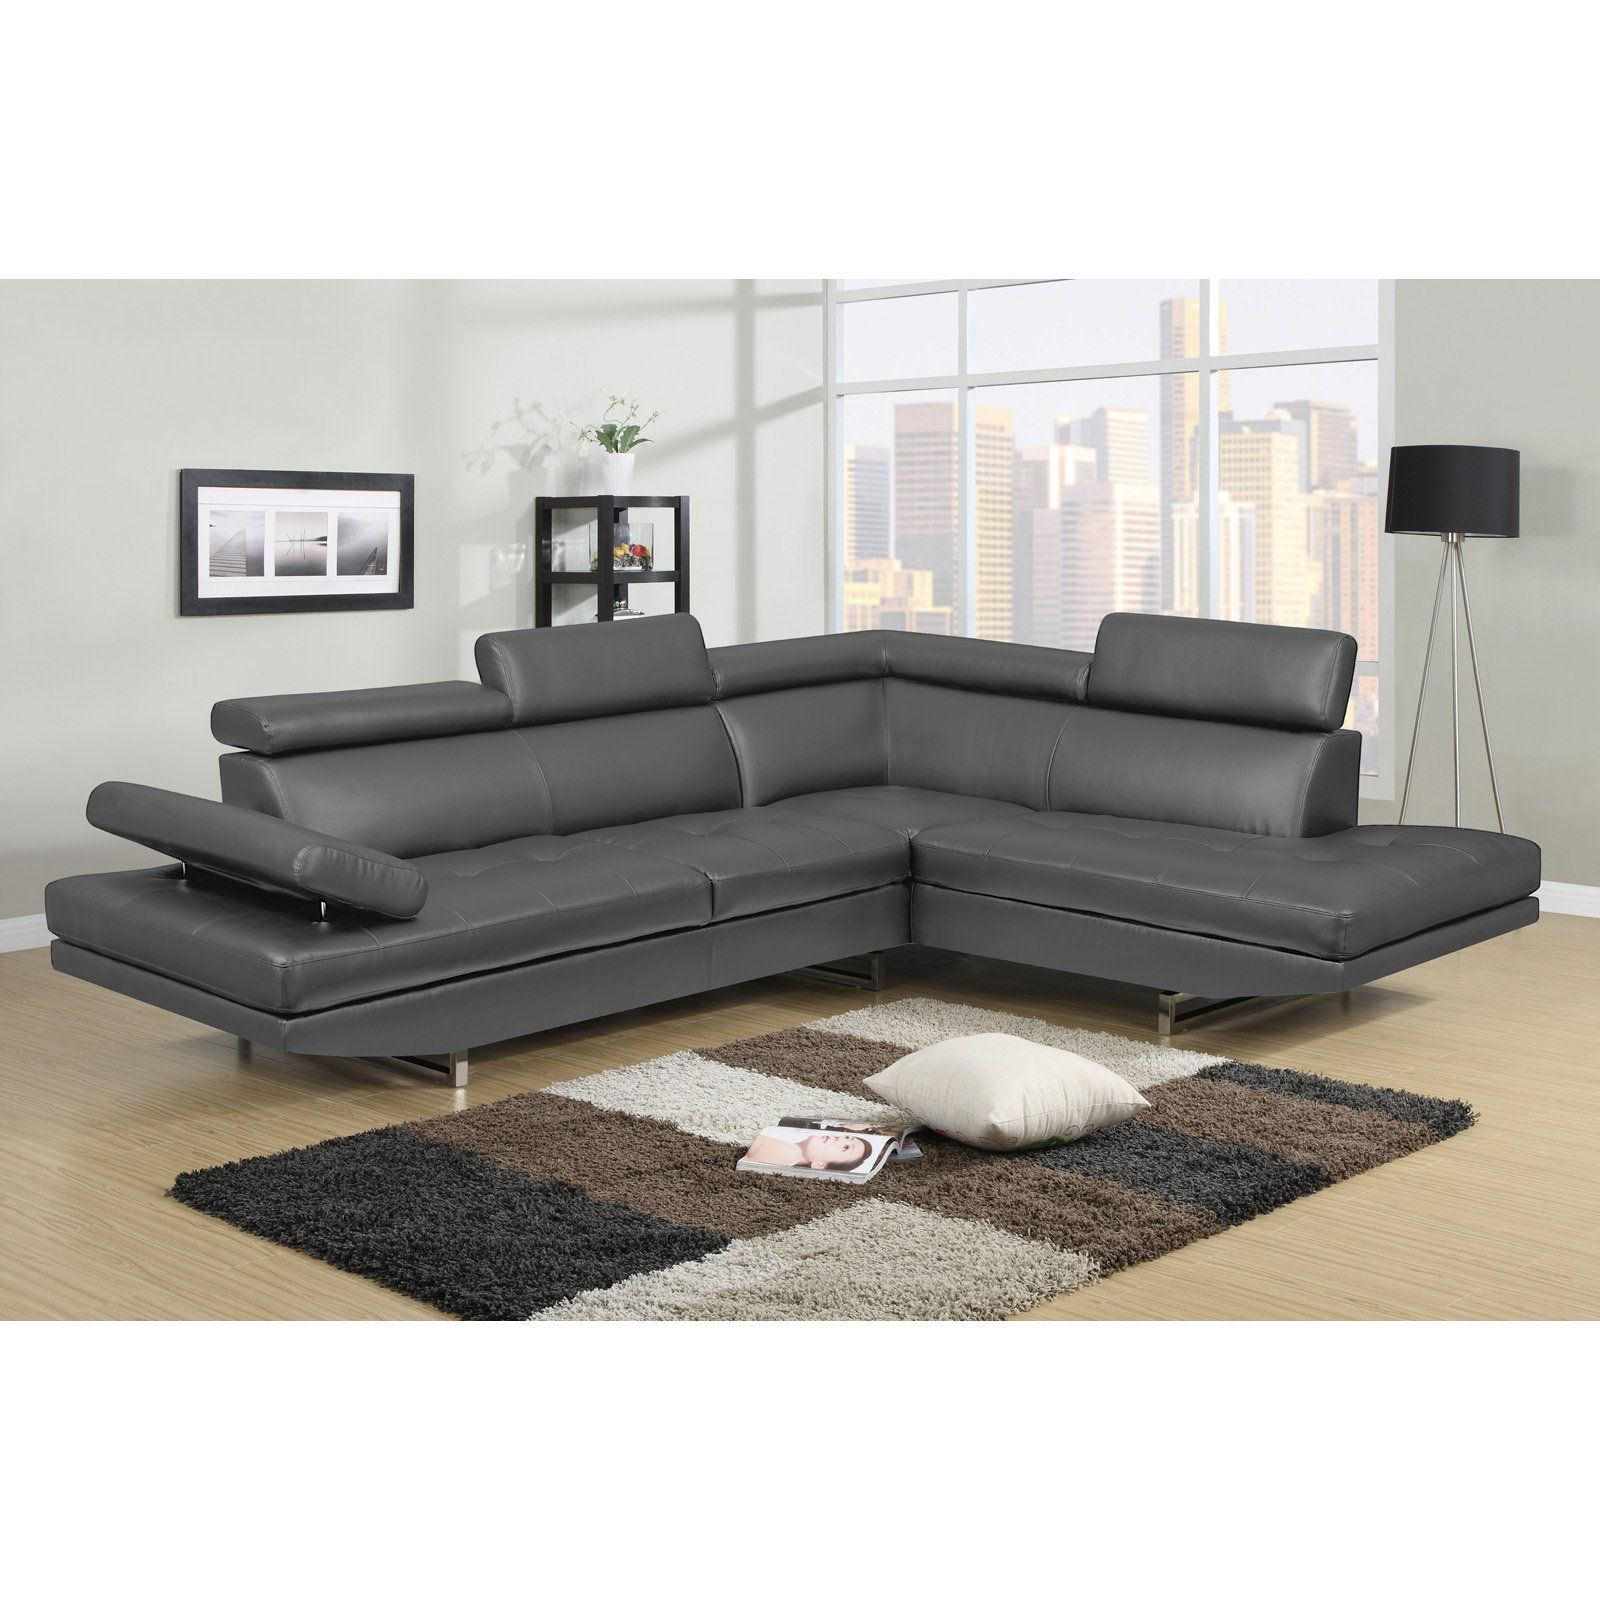 Nh Designs Logan Collection Right Facing Sectional Sofa Sofa